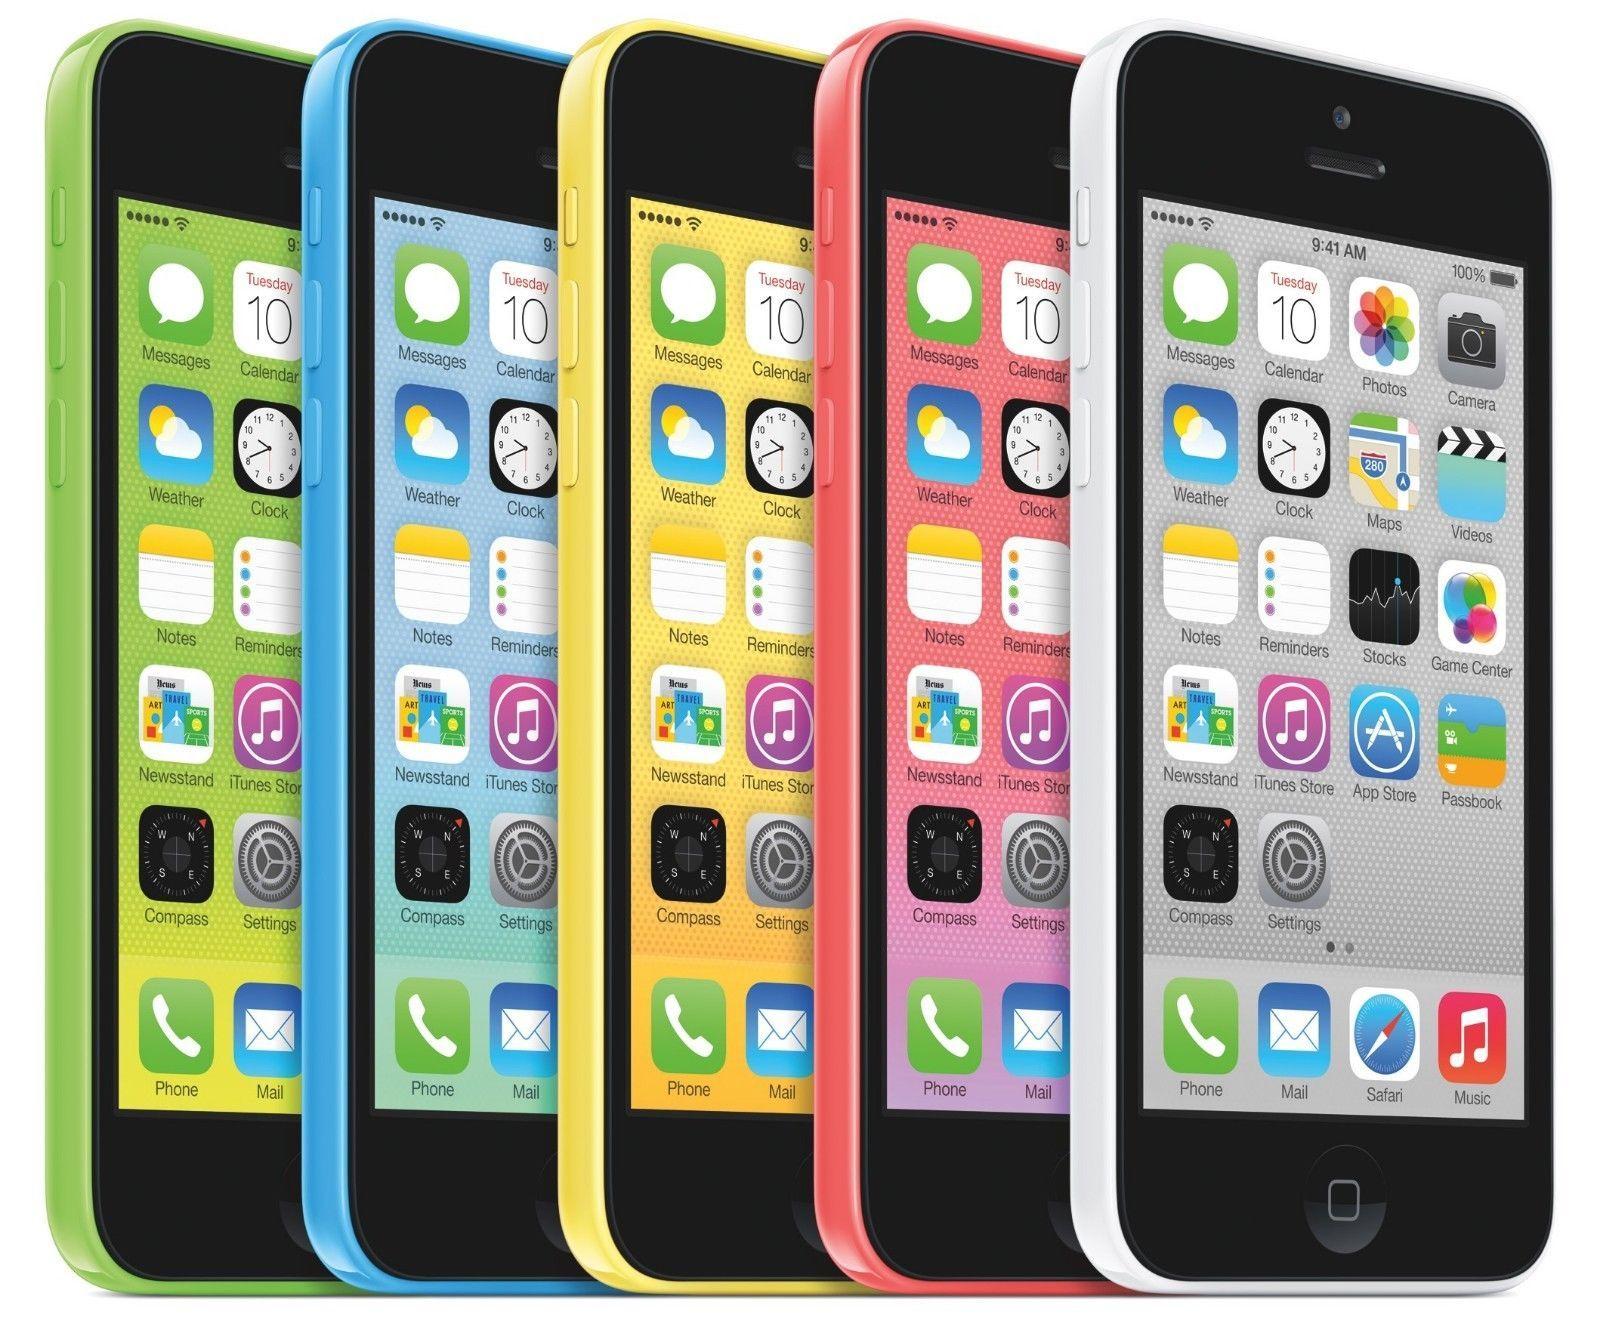 Apple iPhone 5C - 8GB | 16GB - 4G LTE FACTORY GSM UNLOCKED Smartphone